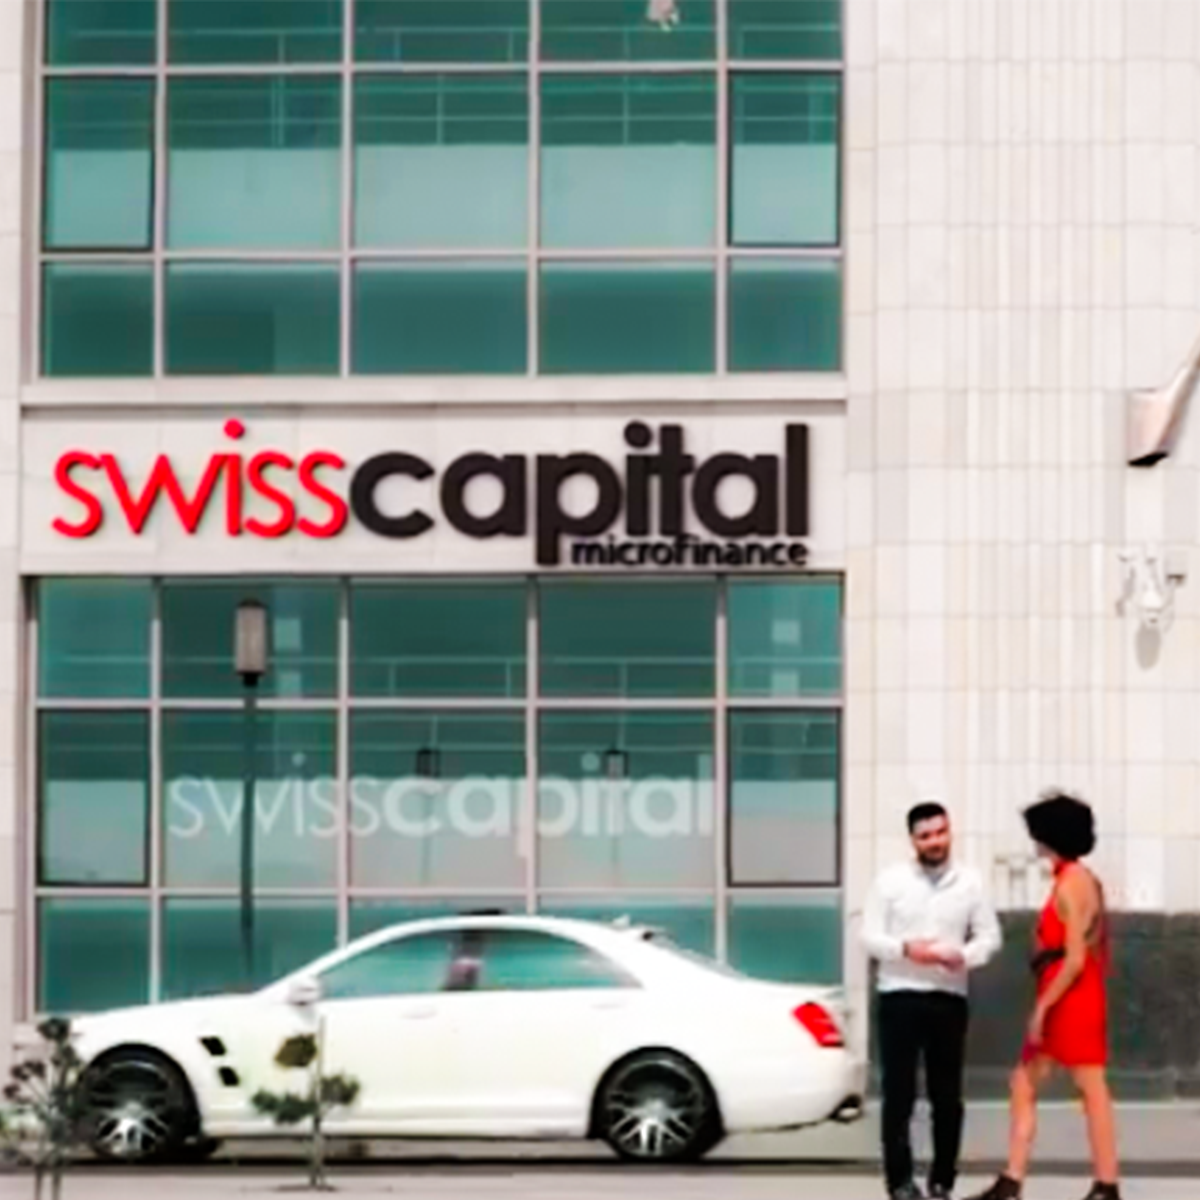 Swiss Capital-ყველაზე მარტივი და სწრაფი ავტოლიზინგი